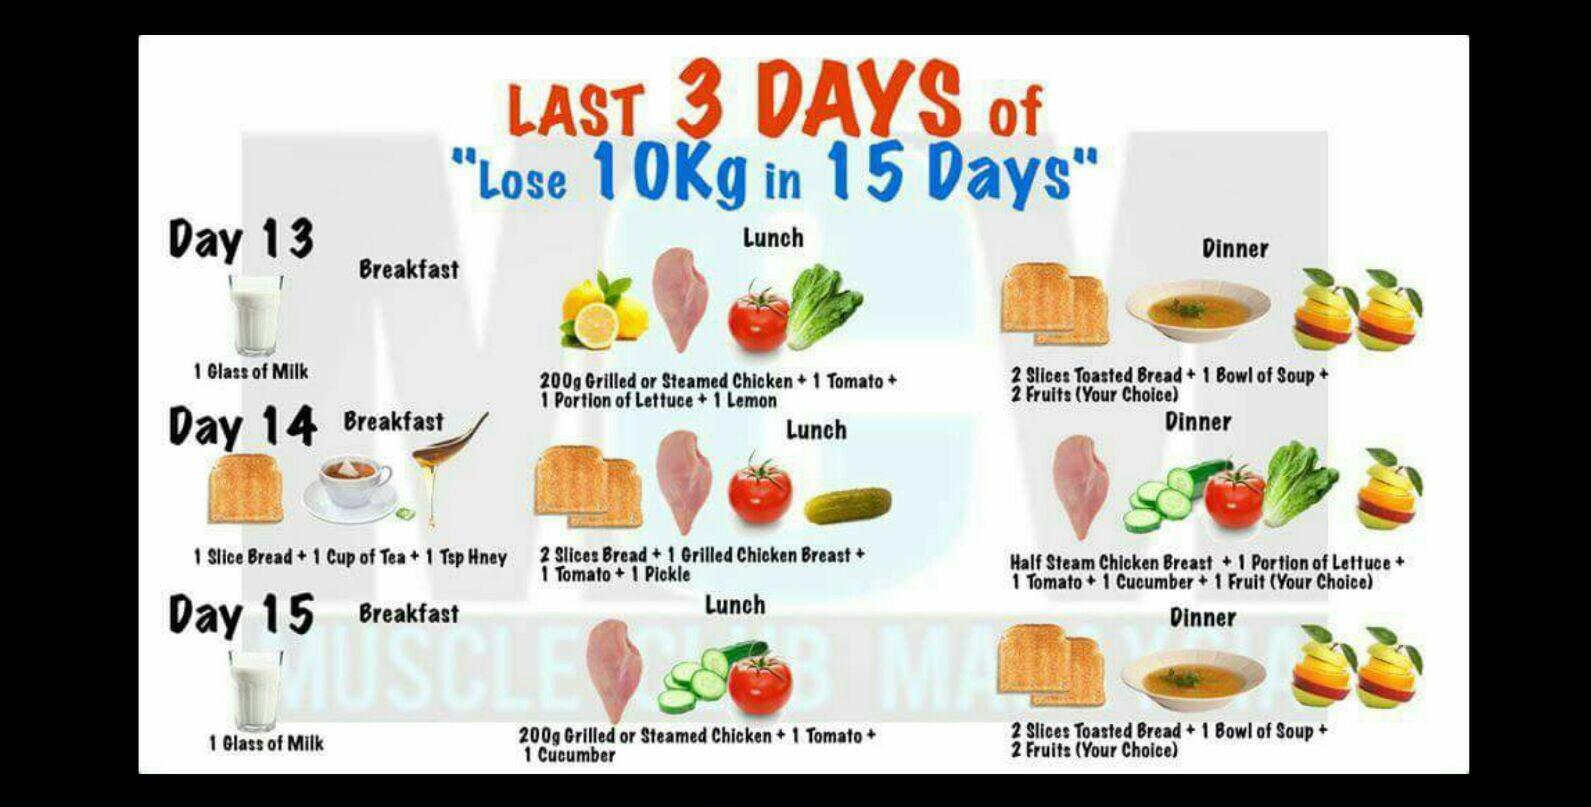 Mengenal Lebih Jauh Diet DEBM